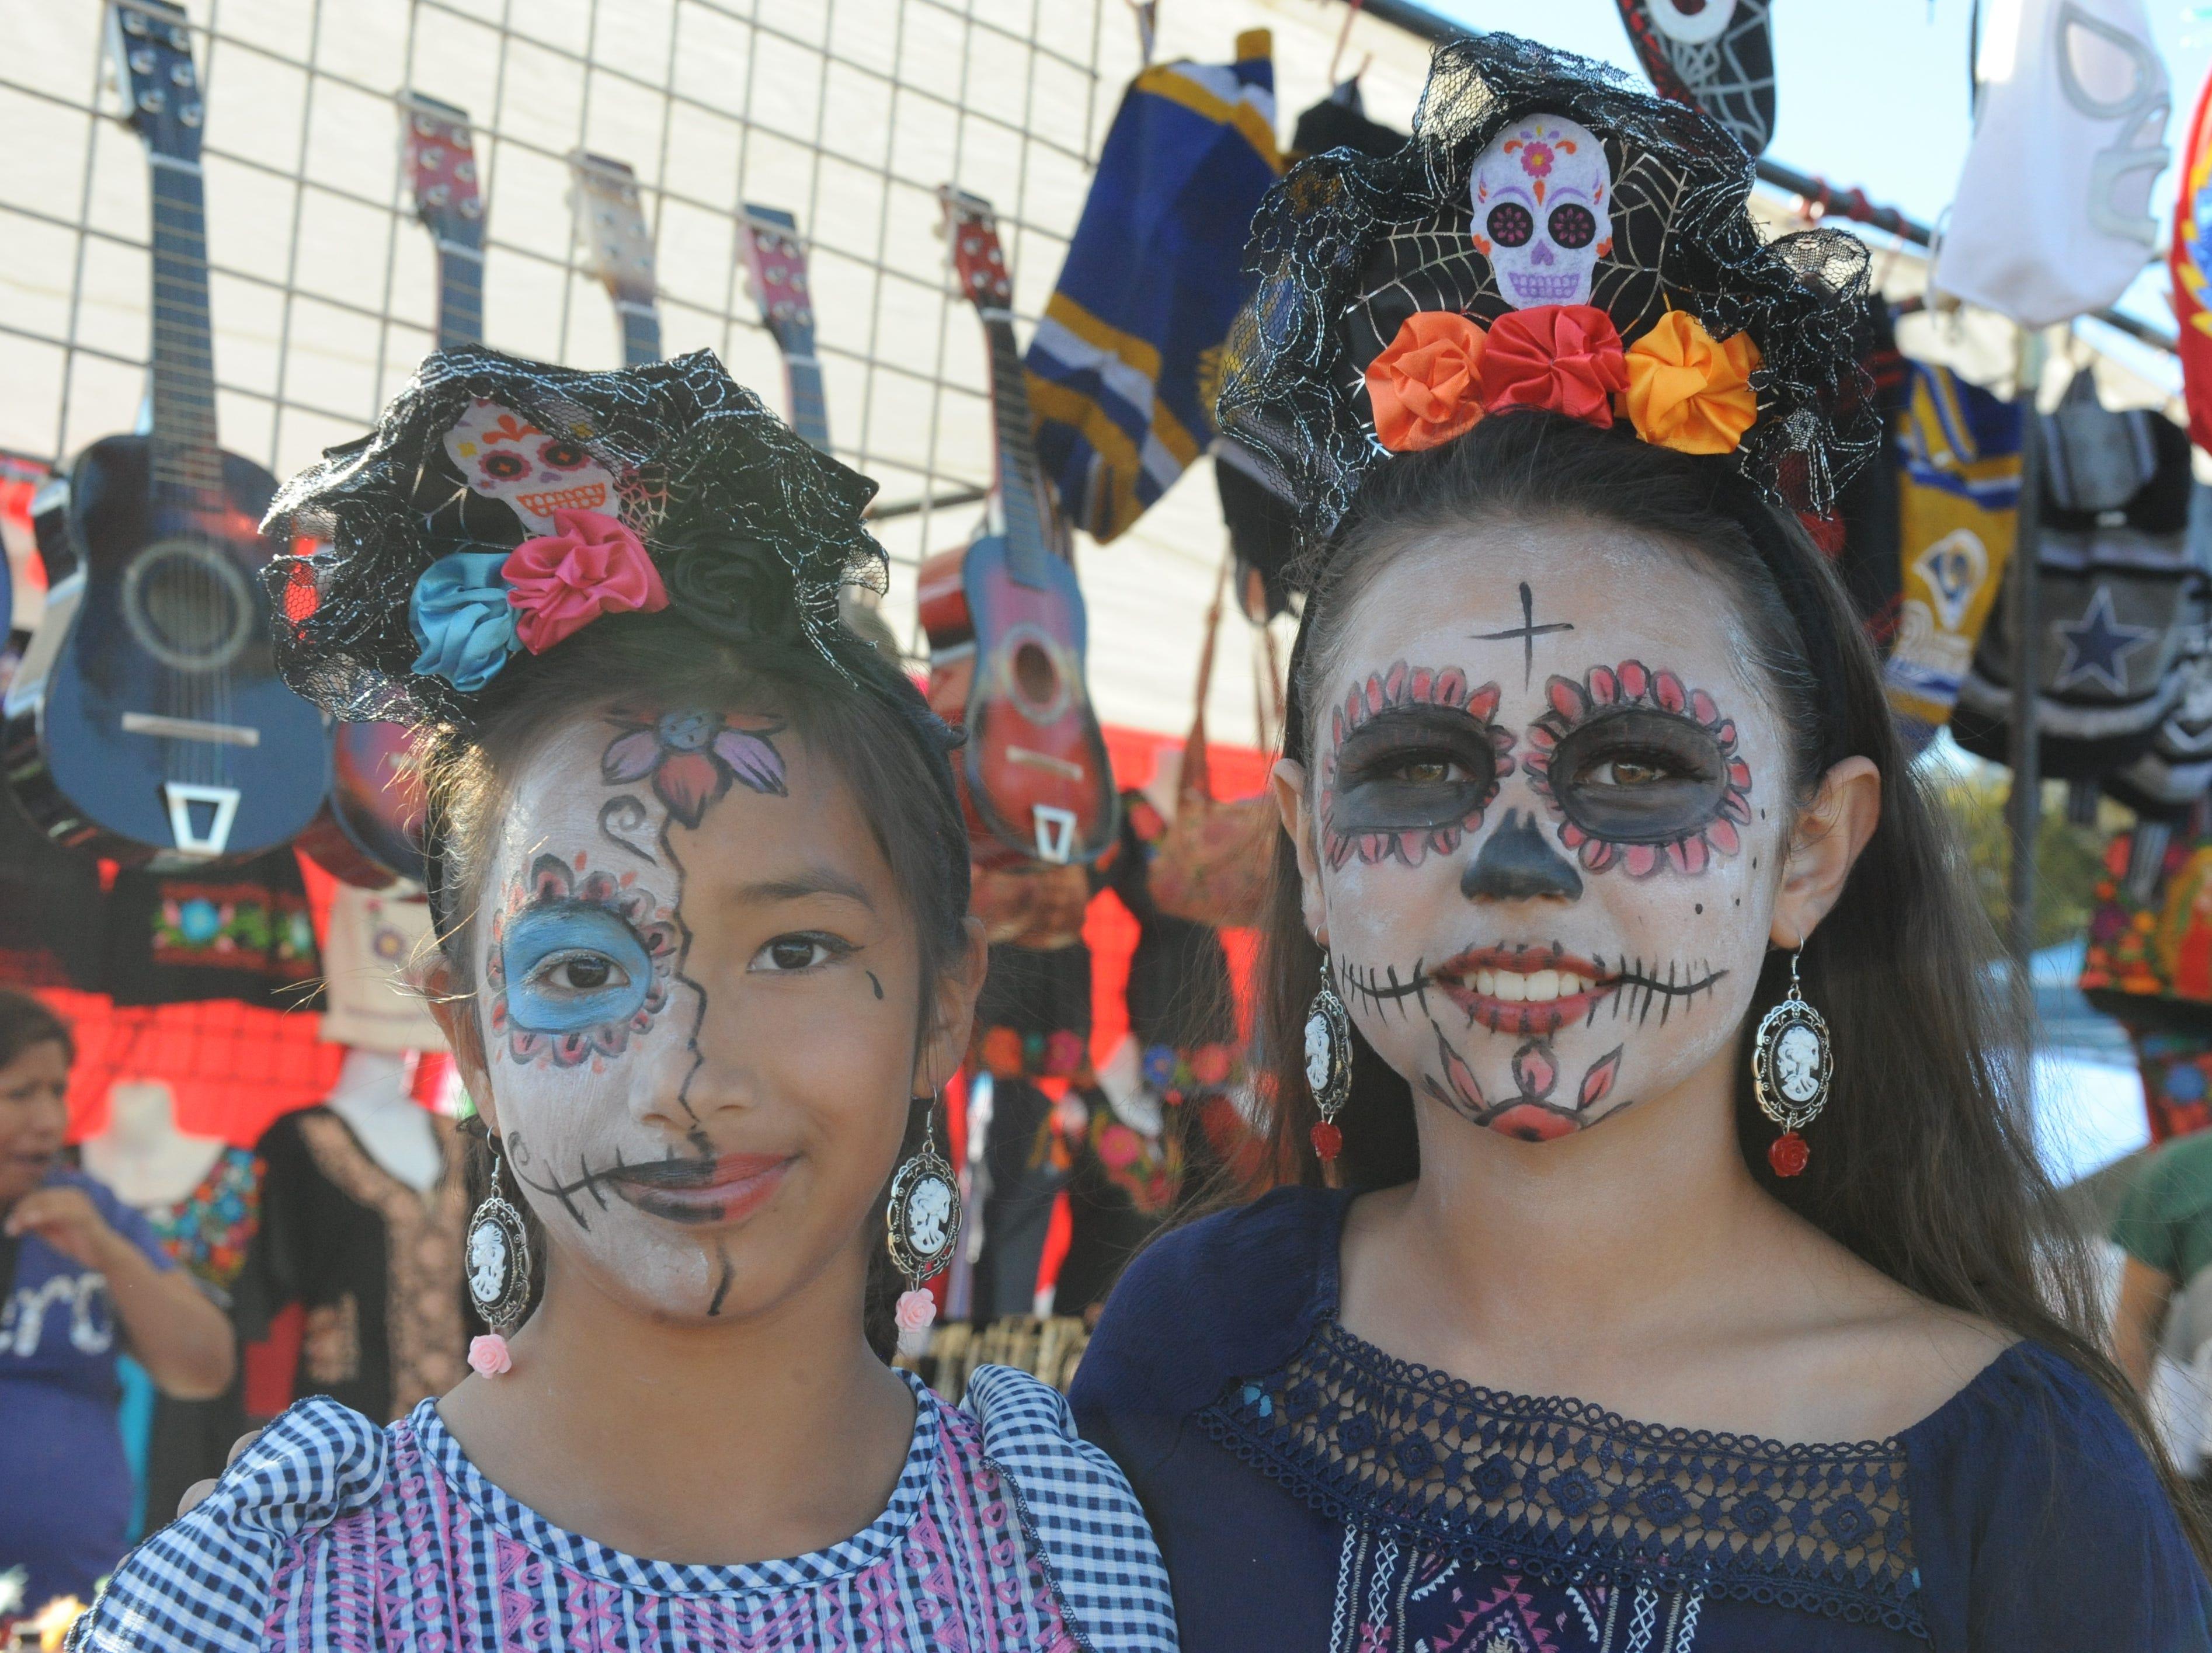 Salinas residents Sheyla Cerda and Lilly Gonzalez had their makeup done by Carlos Gonzalez in preparation for Sunday's Día de los Muertos celebration in Salinas.